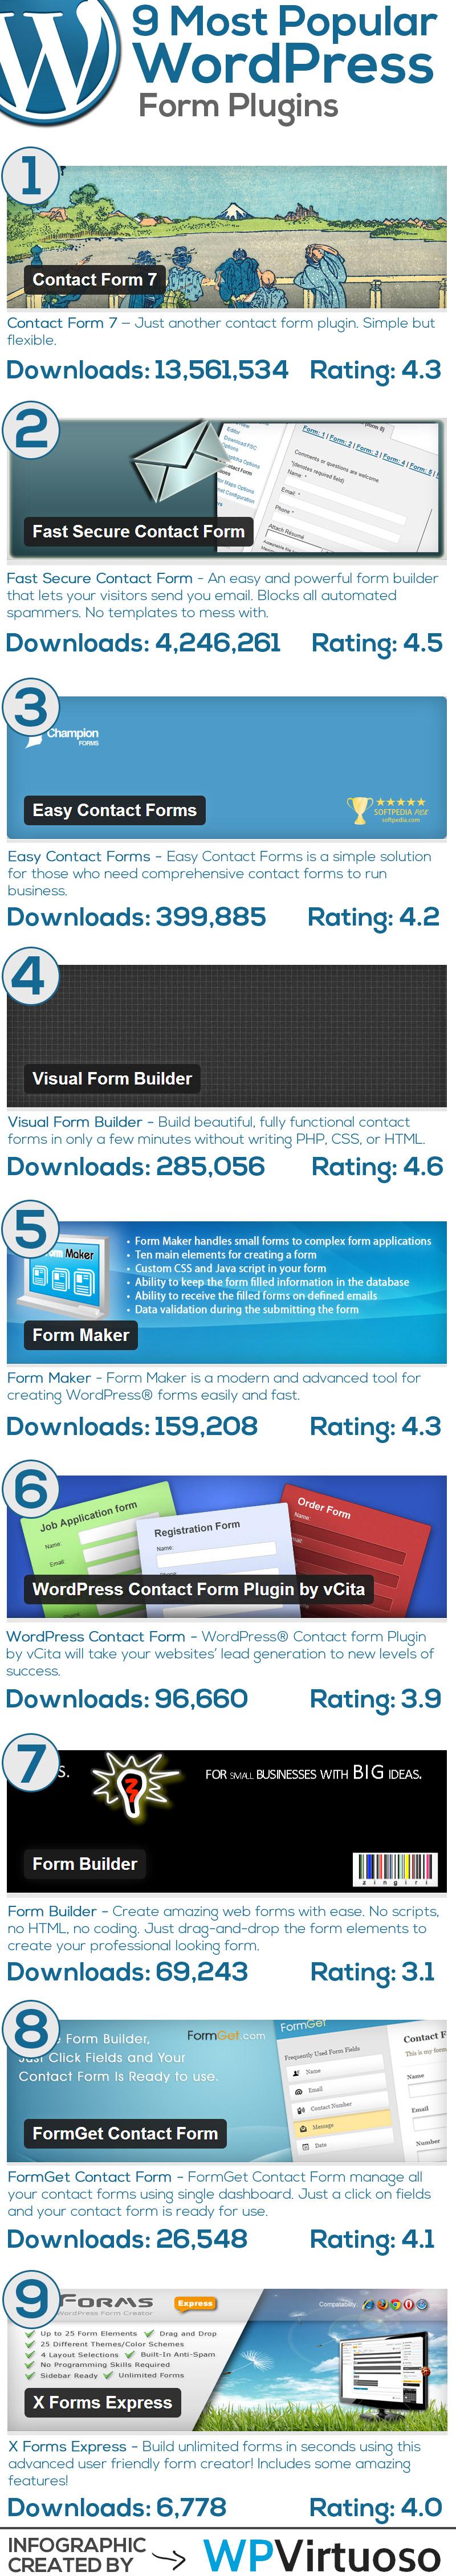 Best-Wordpress-Form-Plugins-Infographic